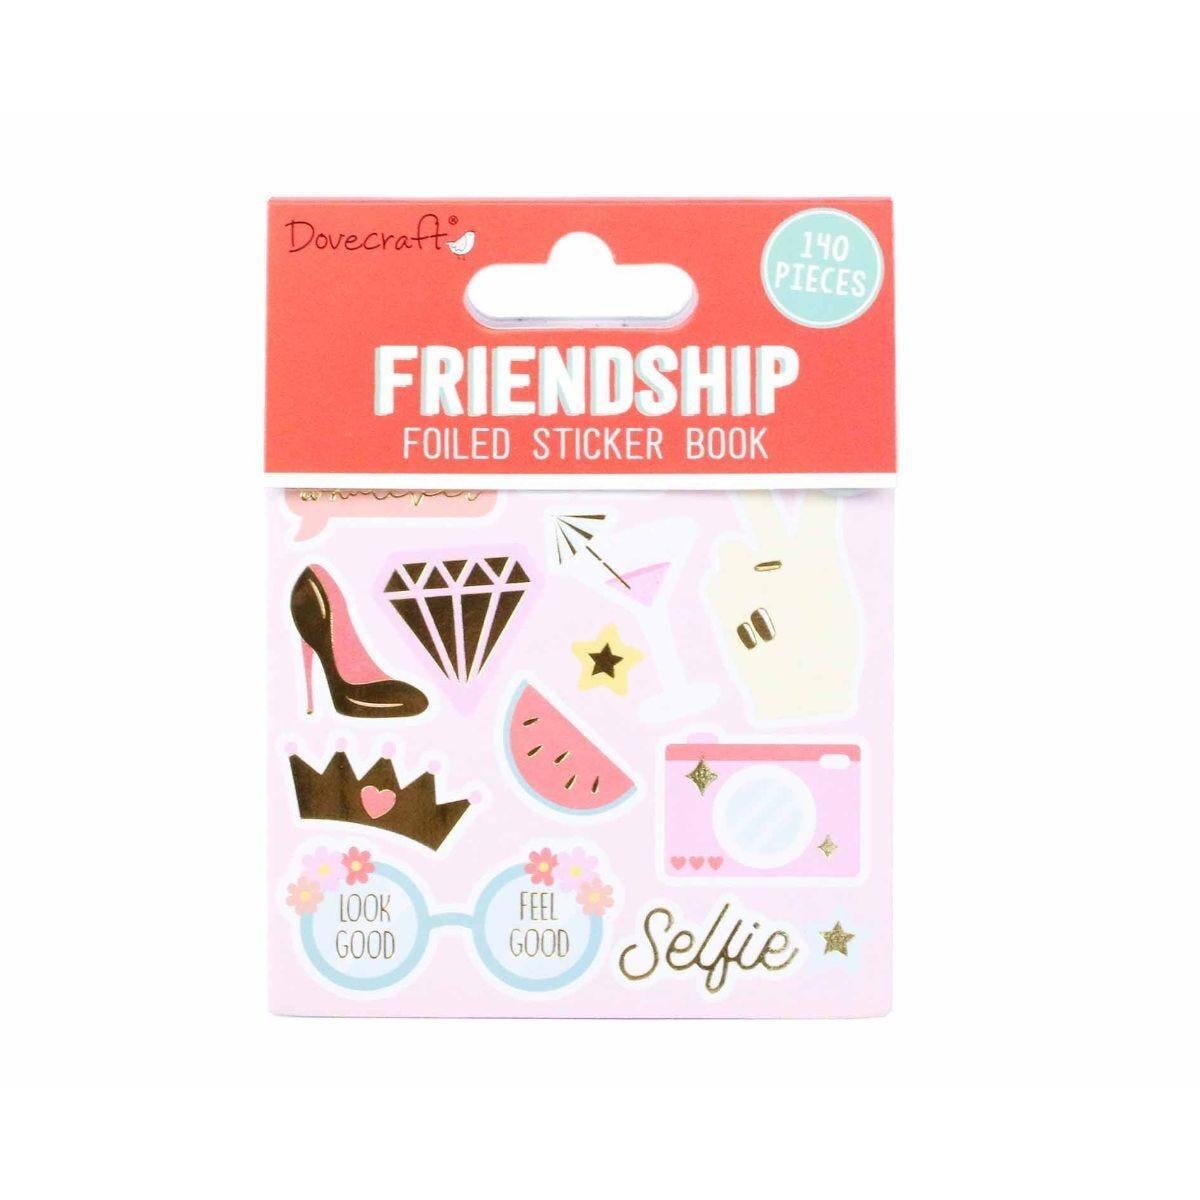 Dovecraft Friendship Foiled Sticker Book